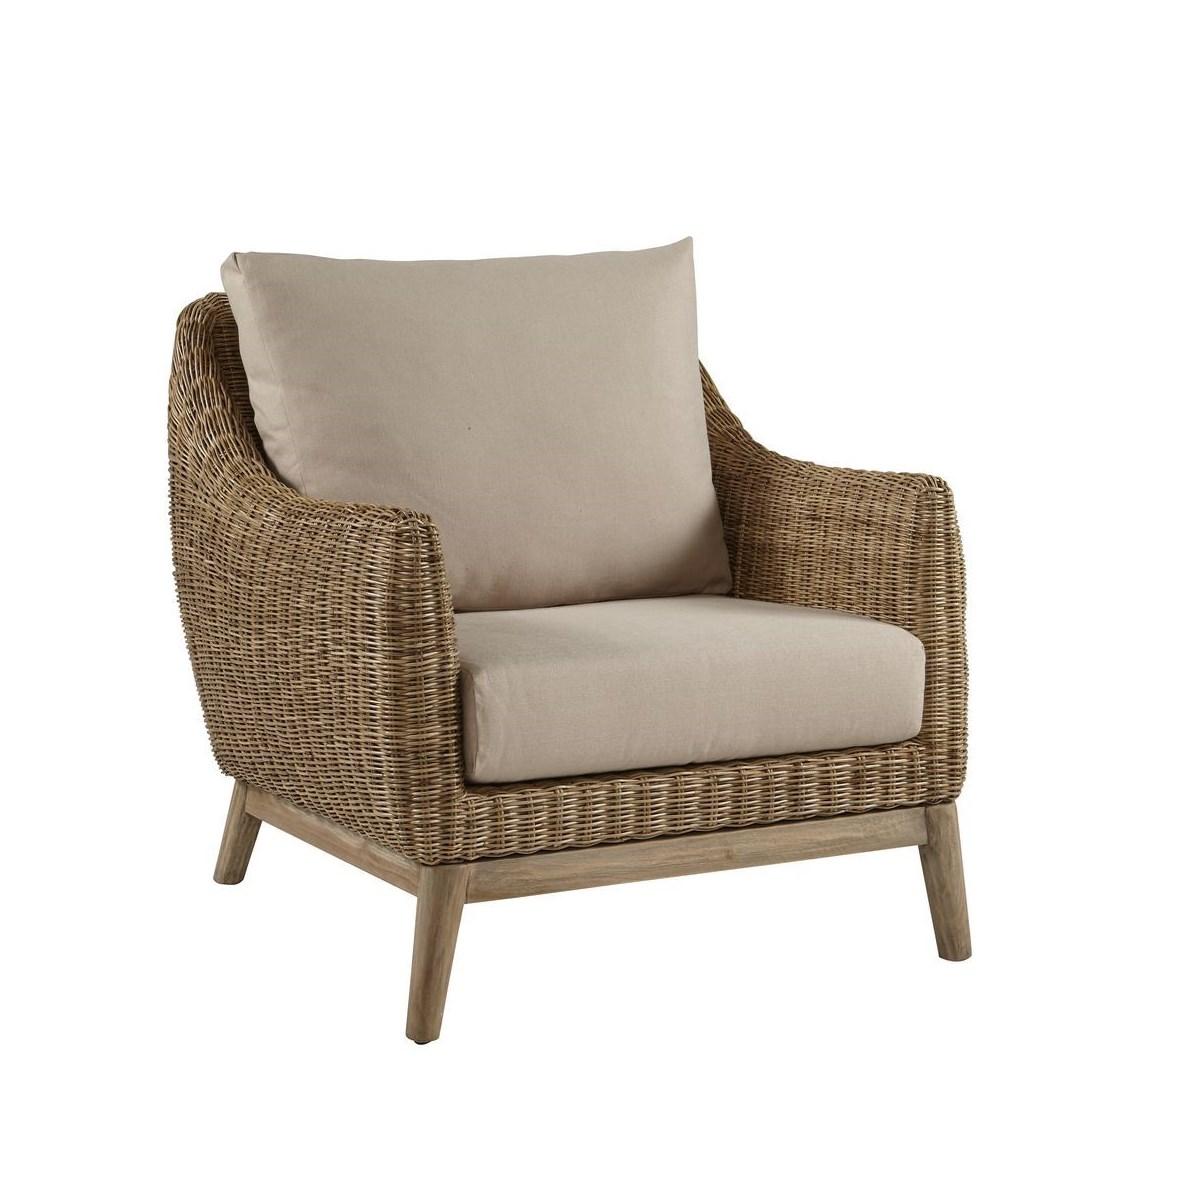 Metropolitan Club Chair Stone Weave, Old Gray Frame Cushion Color - Linen